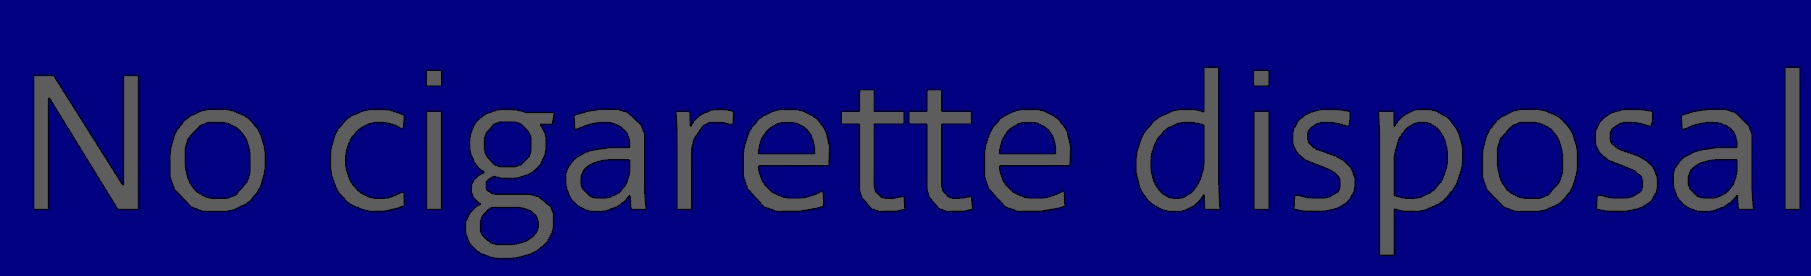 Multiple fonts? The letter